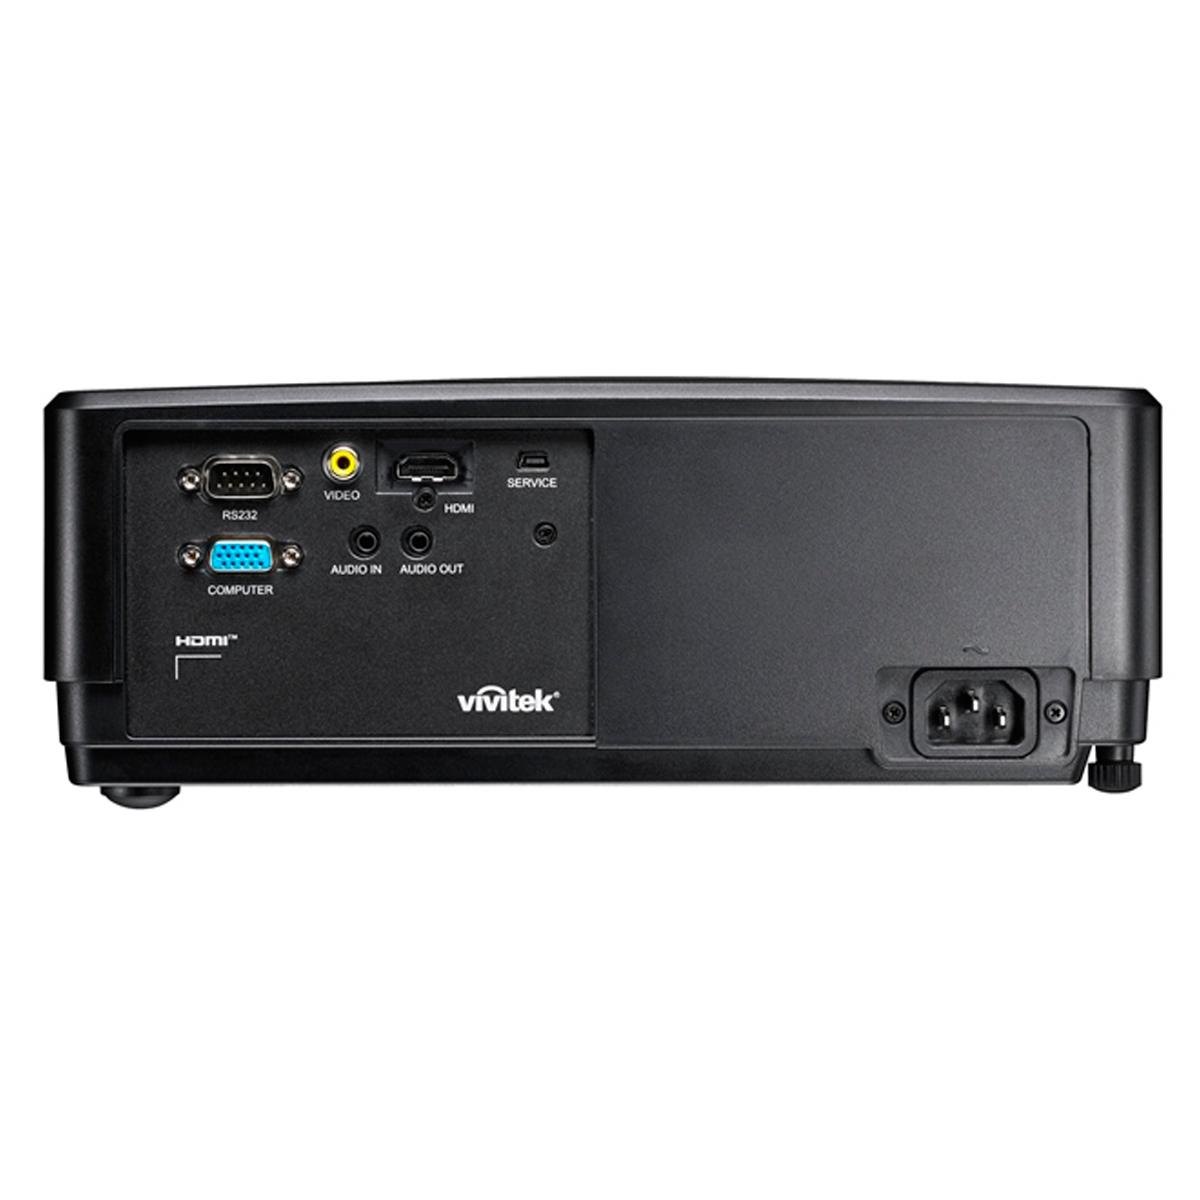 Projetor 3200 Lumens / SVGA / HDMI / 10000:1 DS 234 - Vivitek